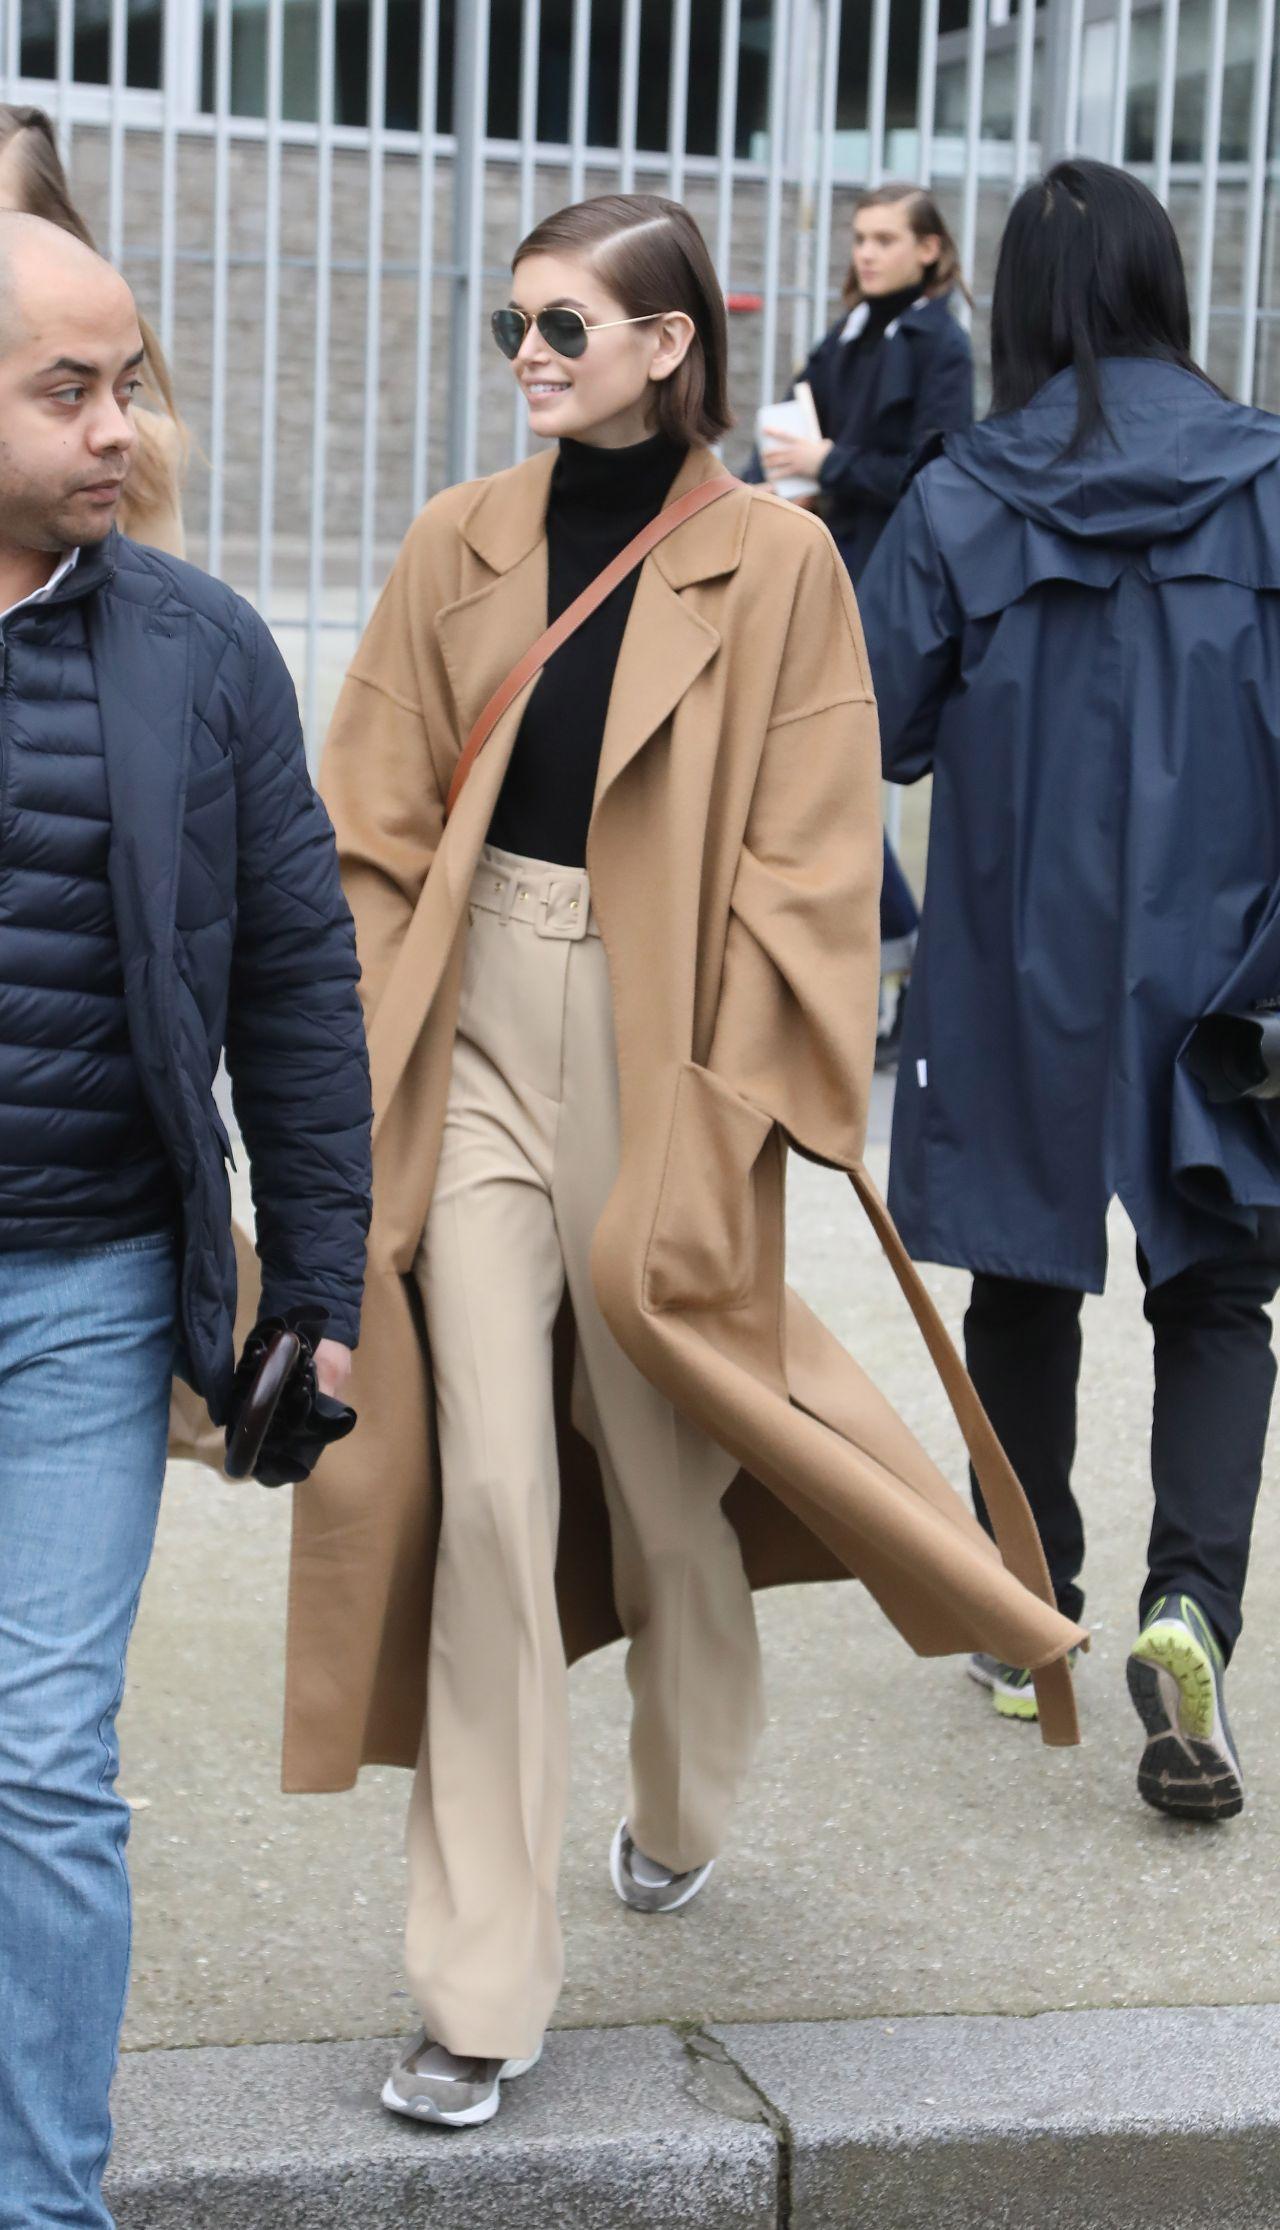 kaia-gerber-in-oversized-coat-nanushka-out-in-paris